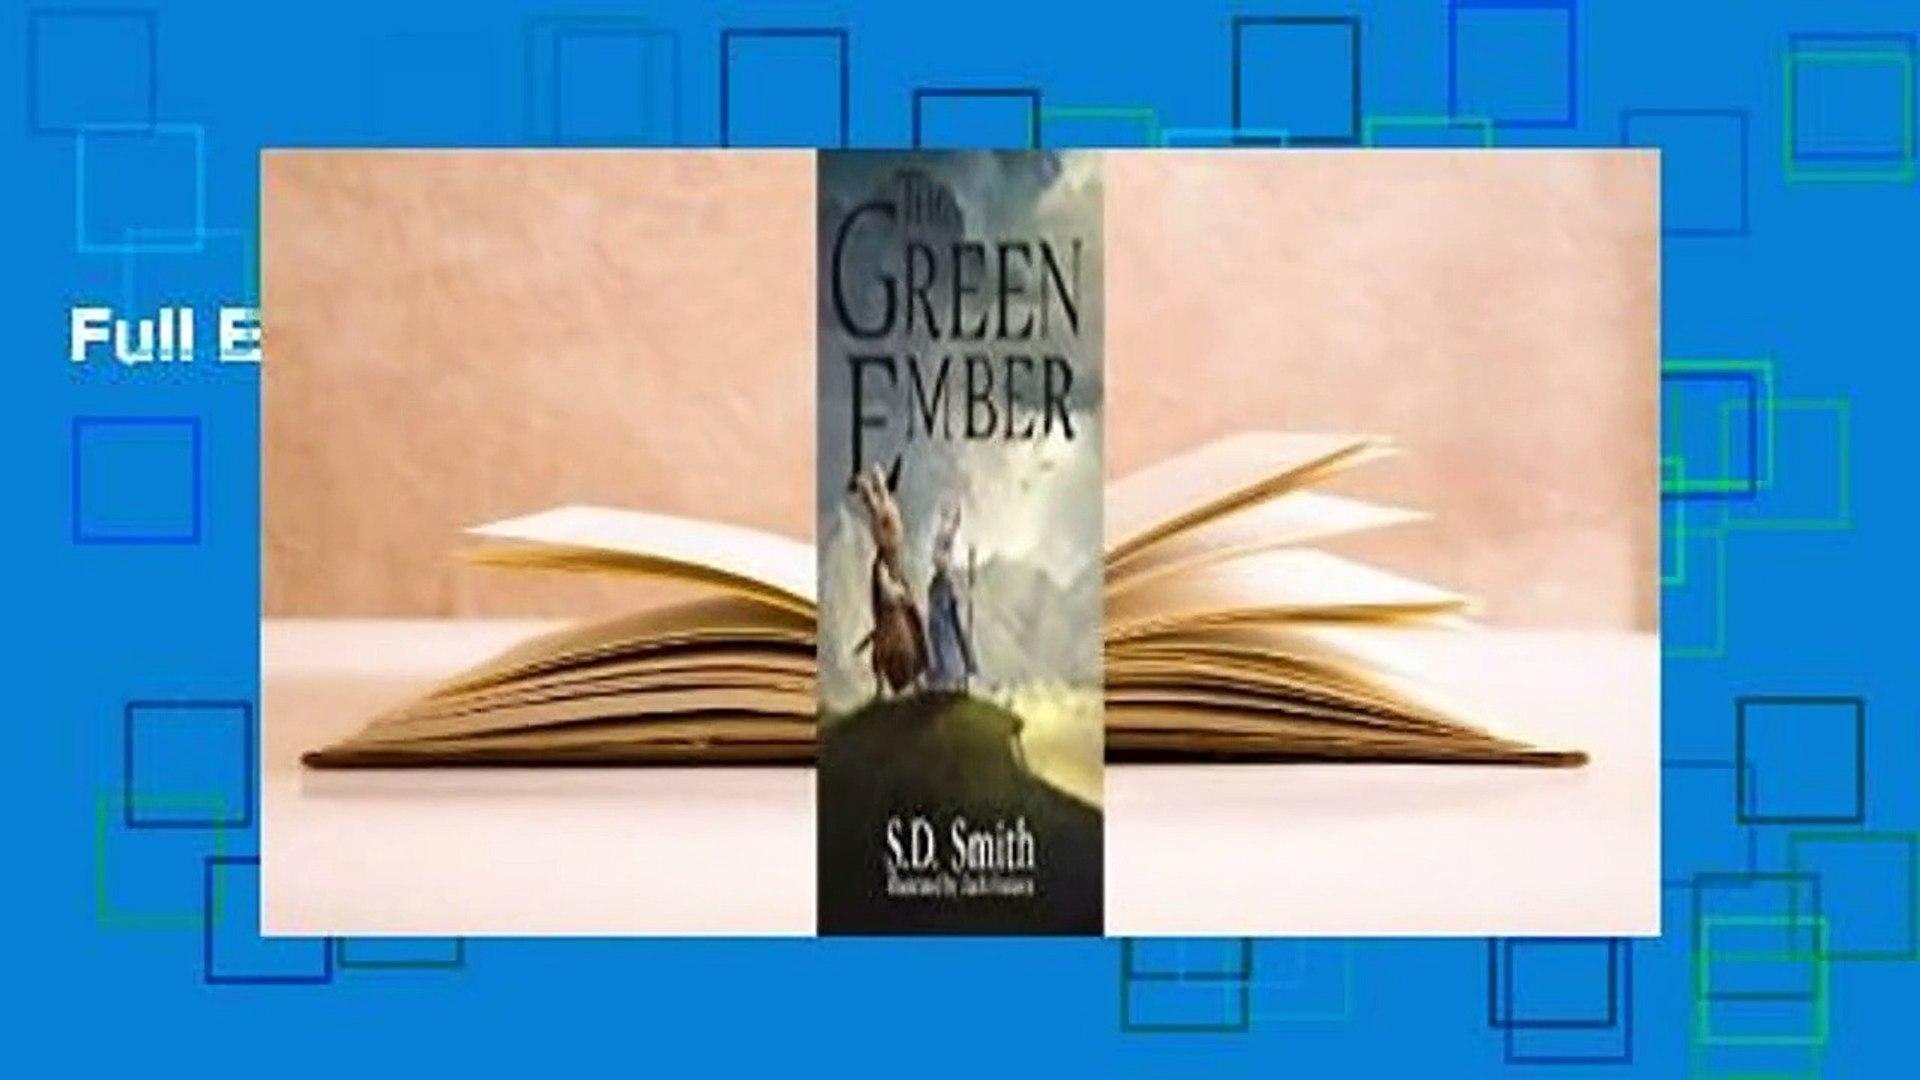 Full E-book The Green Ember  For Free